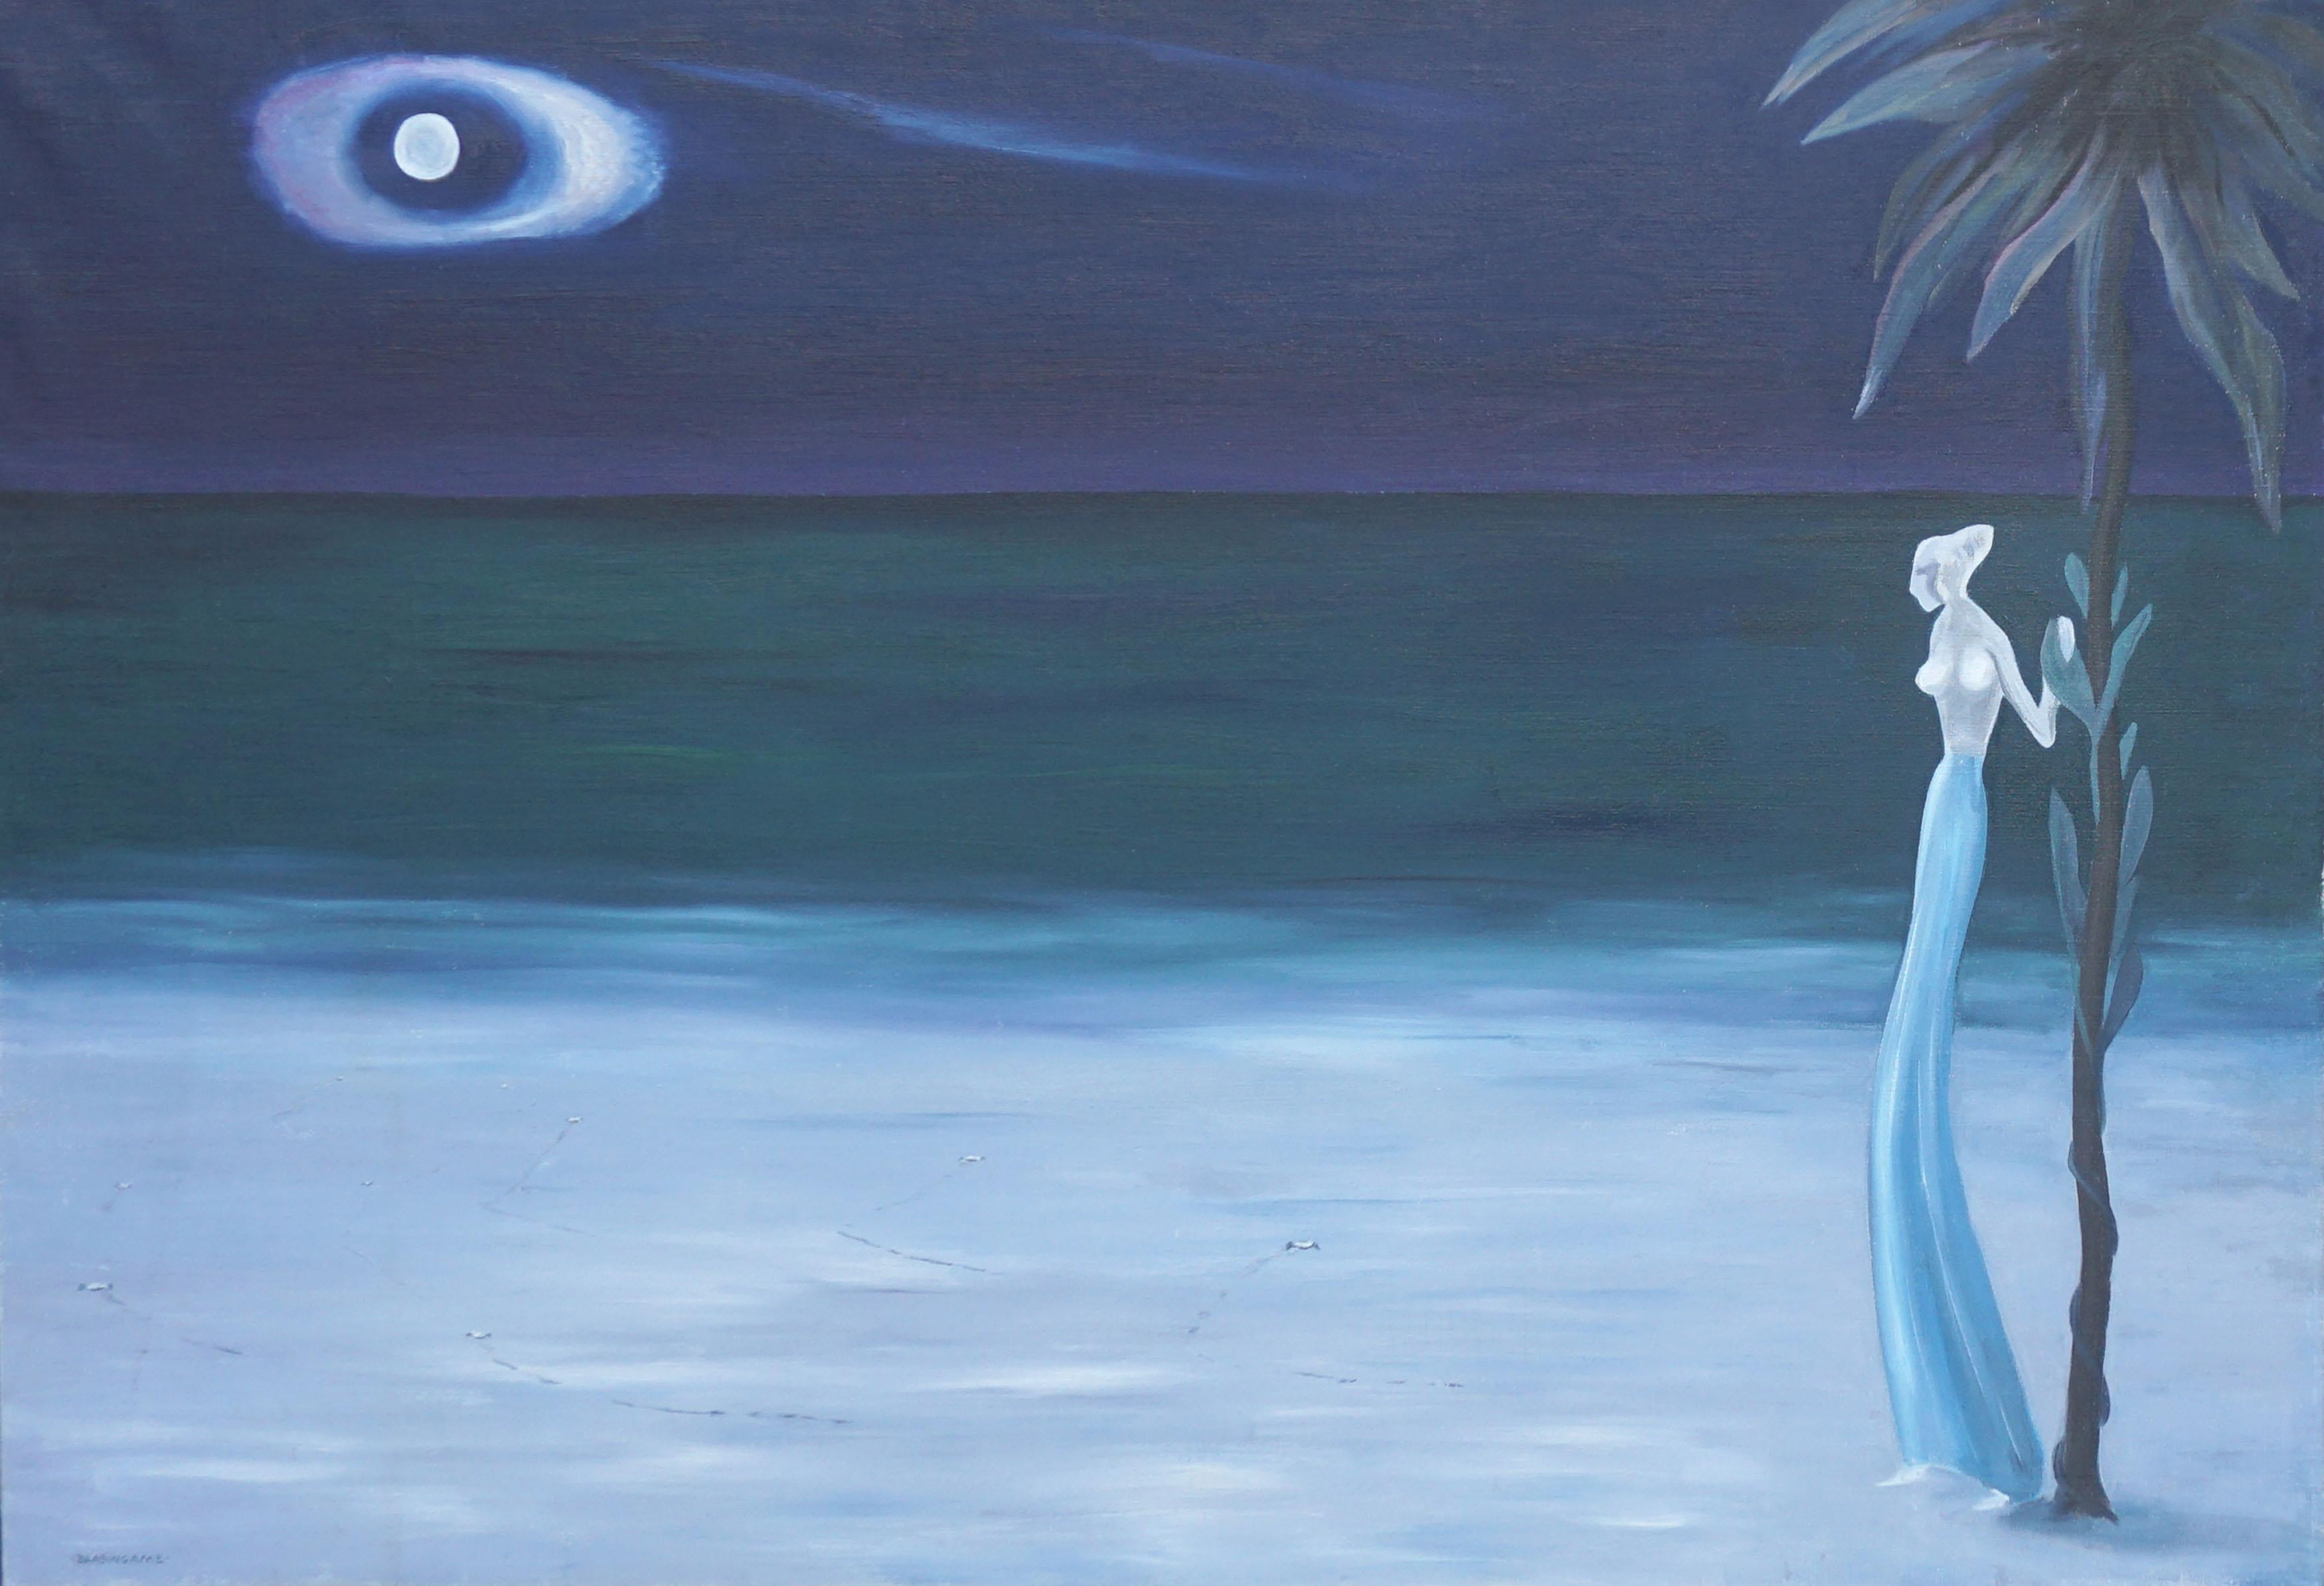 Surrealist Nocturnal Hawaiian Figurative Landscape w. Blue Skirted Woman & Moon